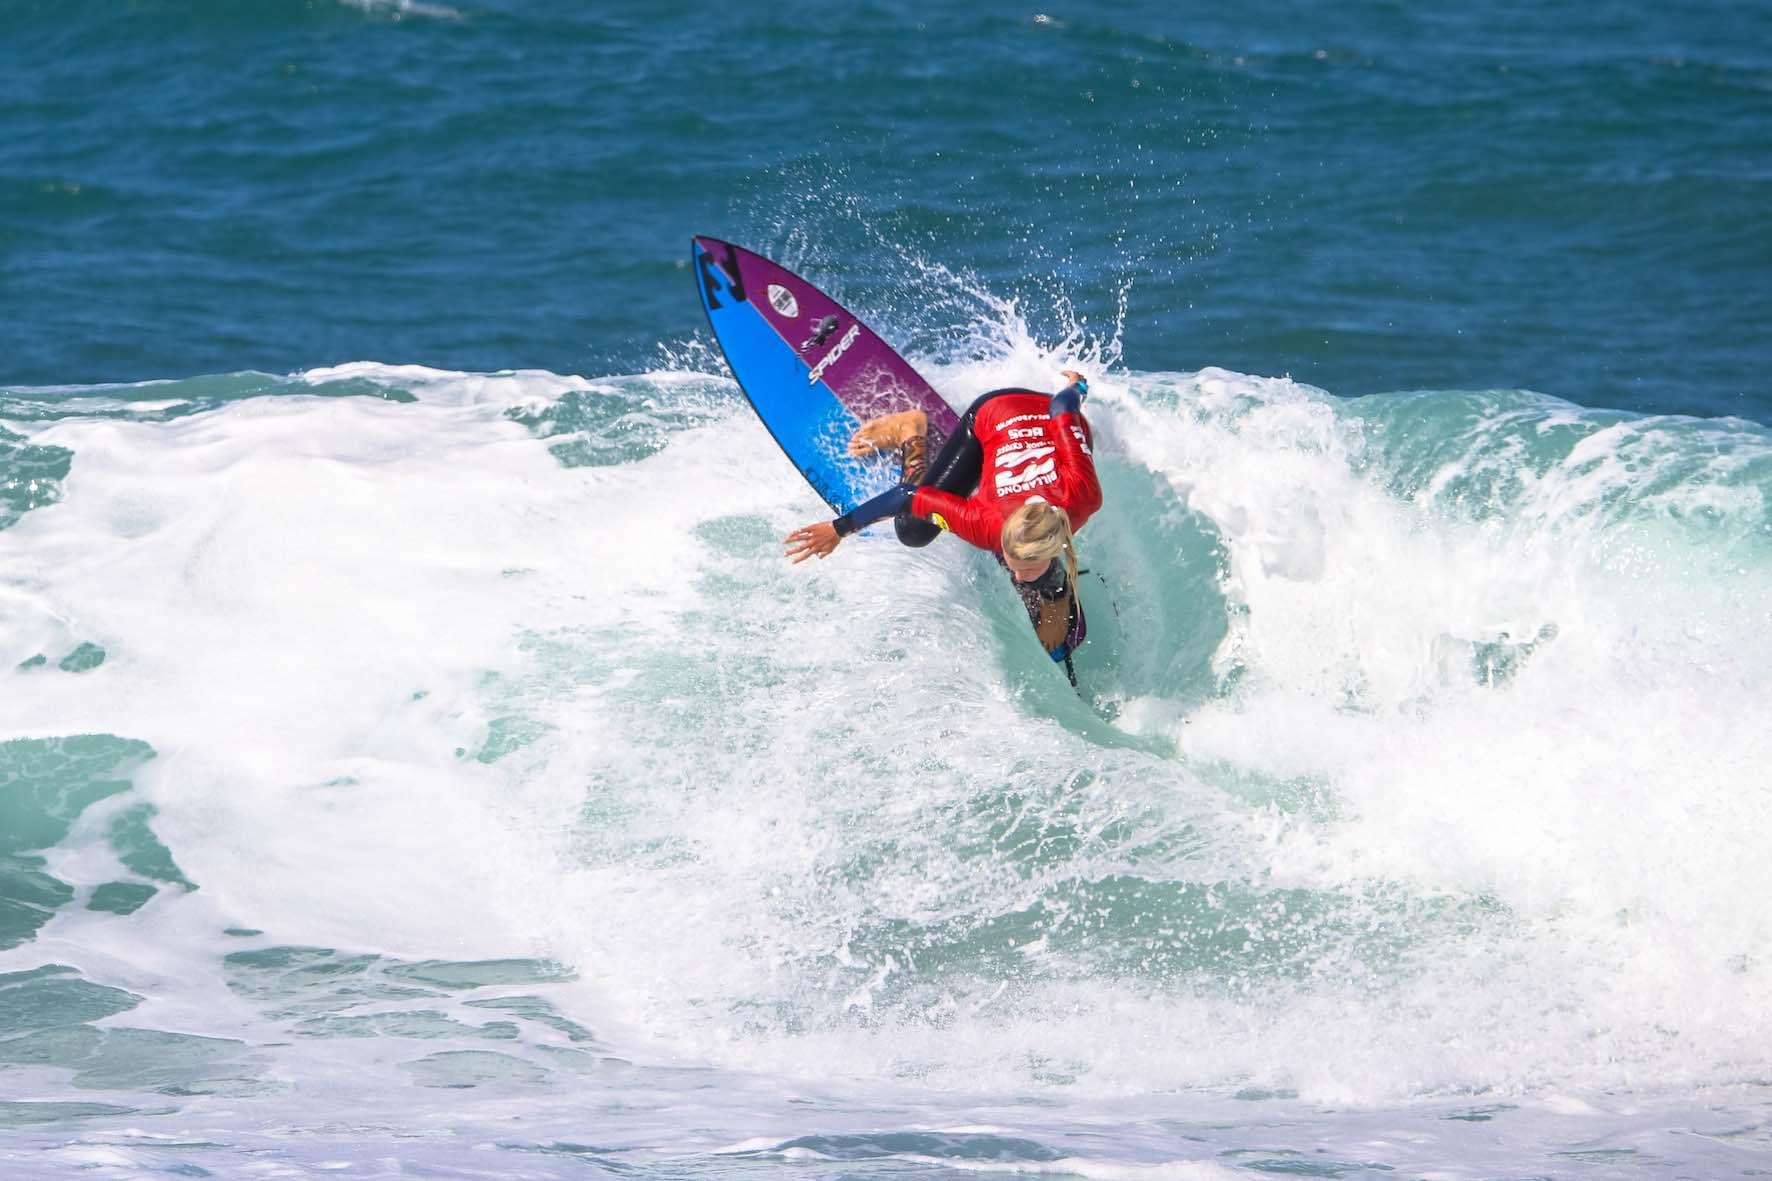 Zoe Steyn surfing in the 2018 Billabong Junior Series finale